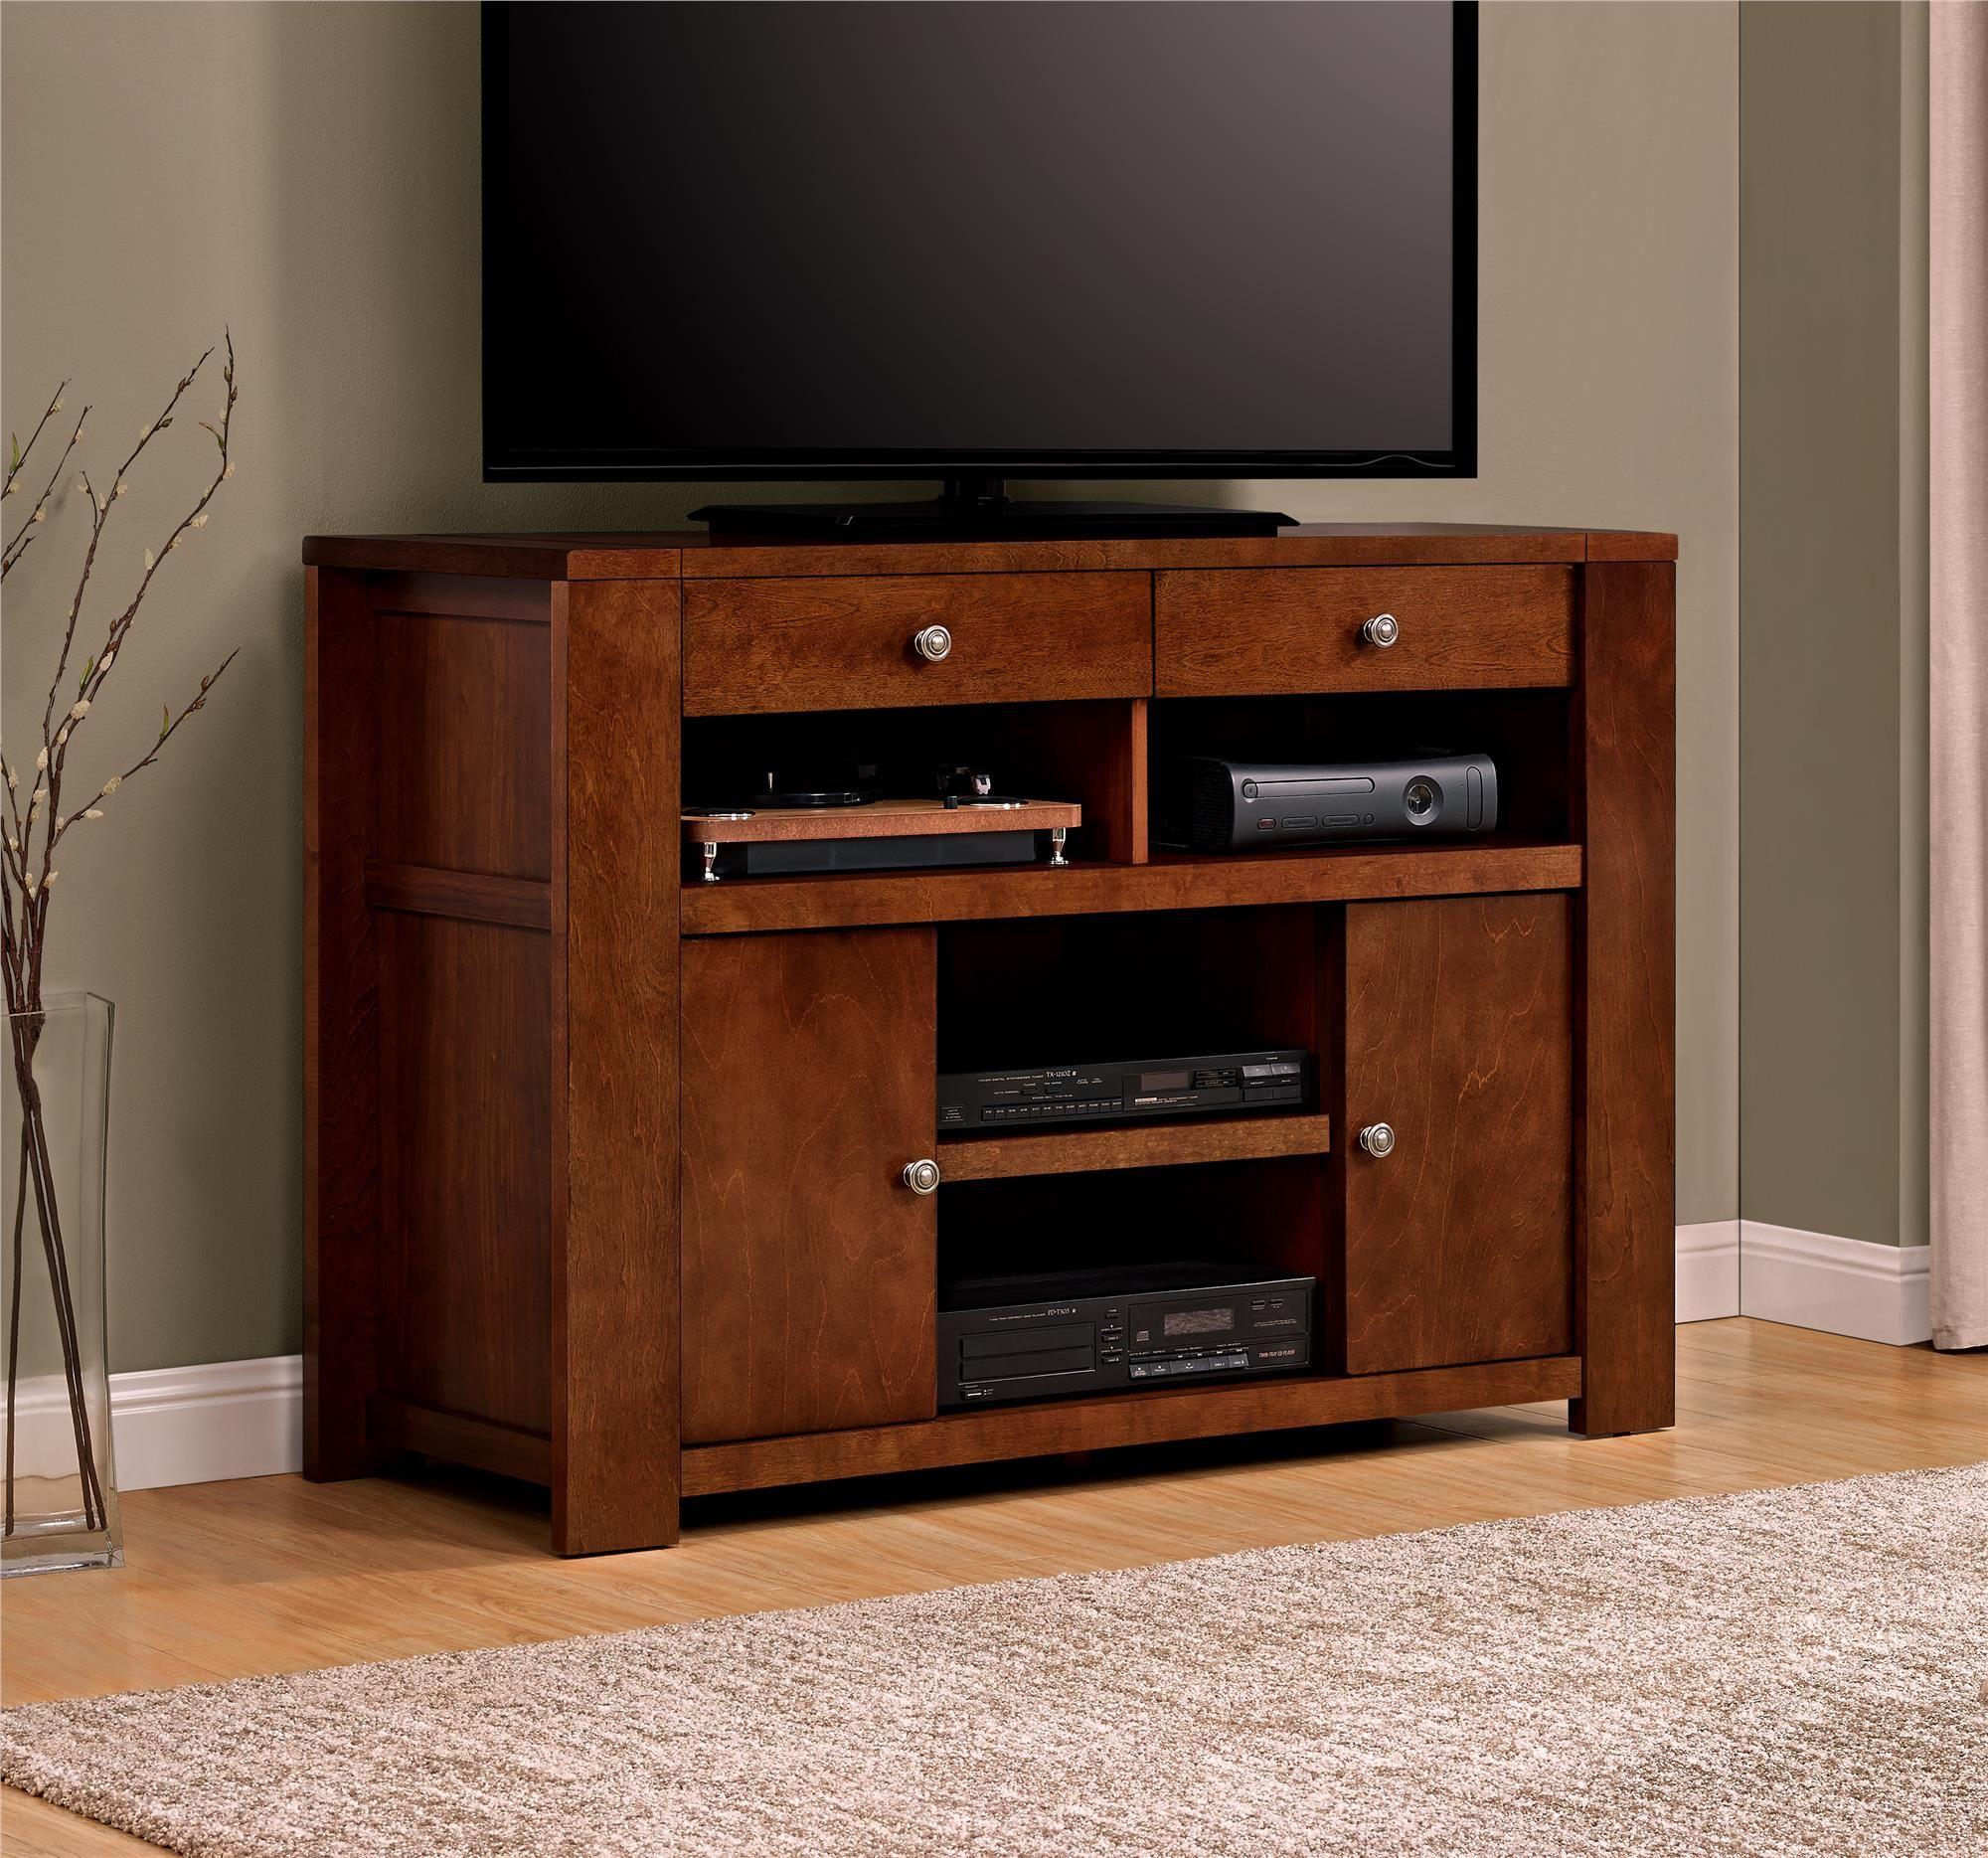 Dorel Home Furnishings Vermont Farmhouse Madison Cherry TV Stand